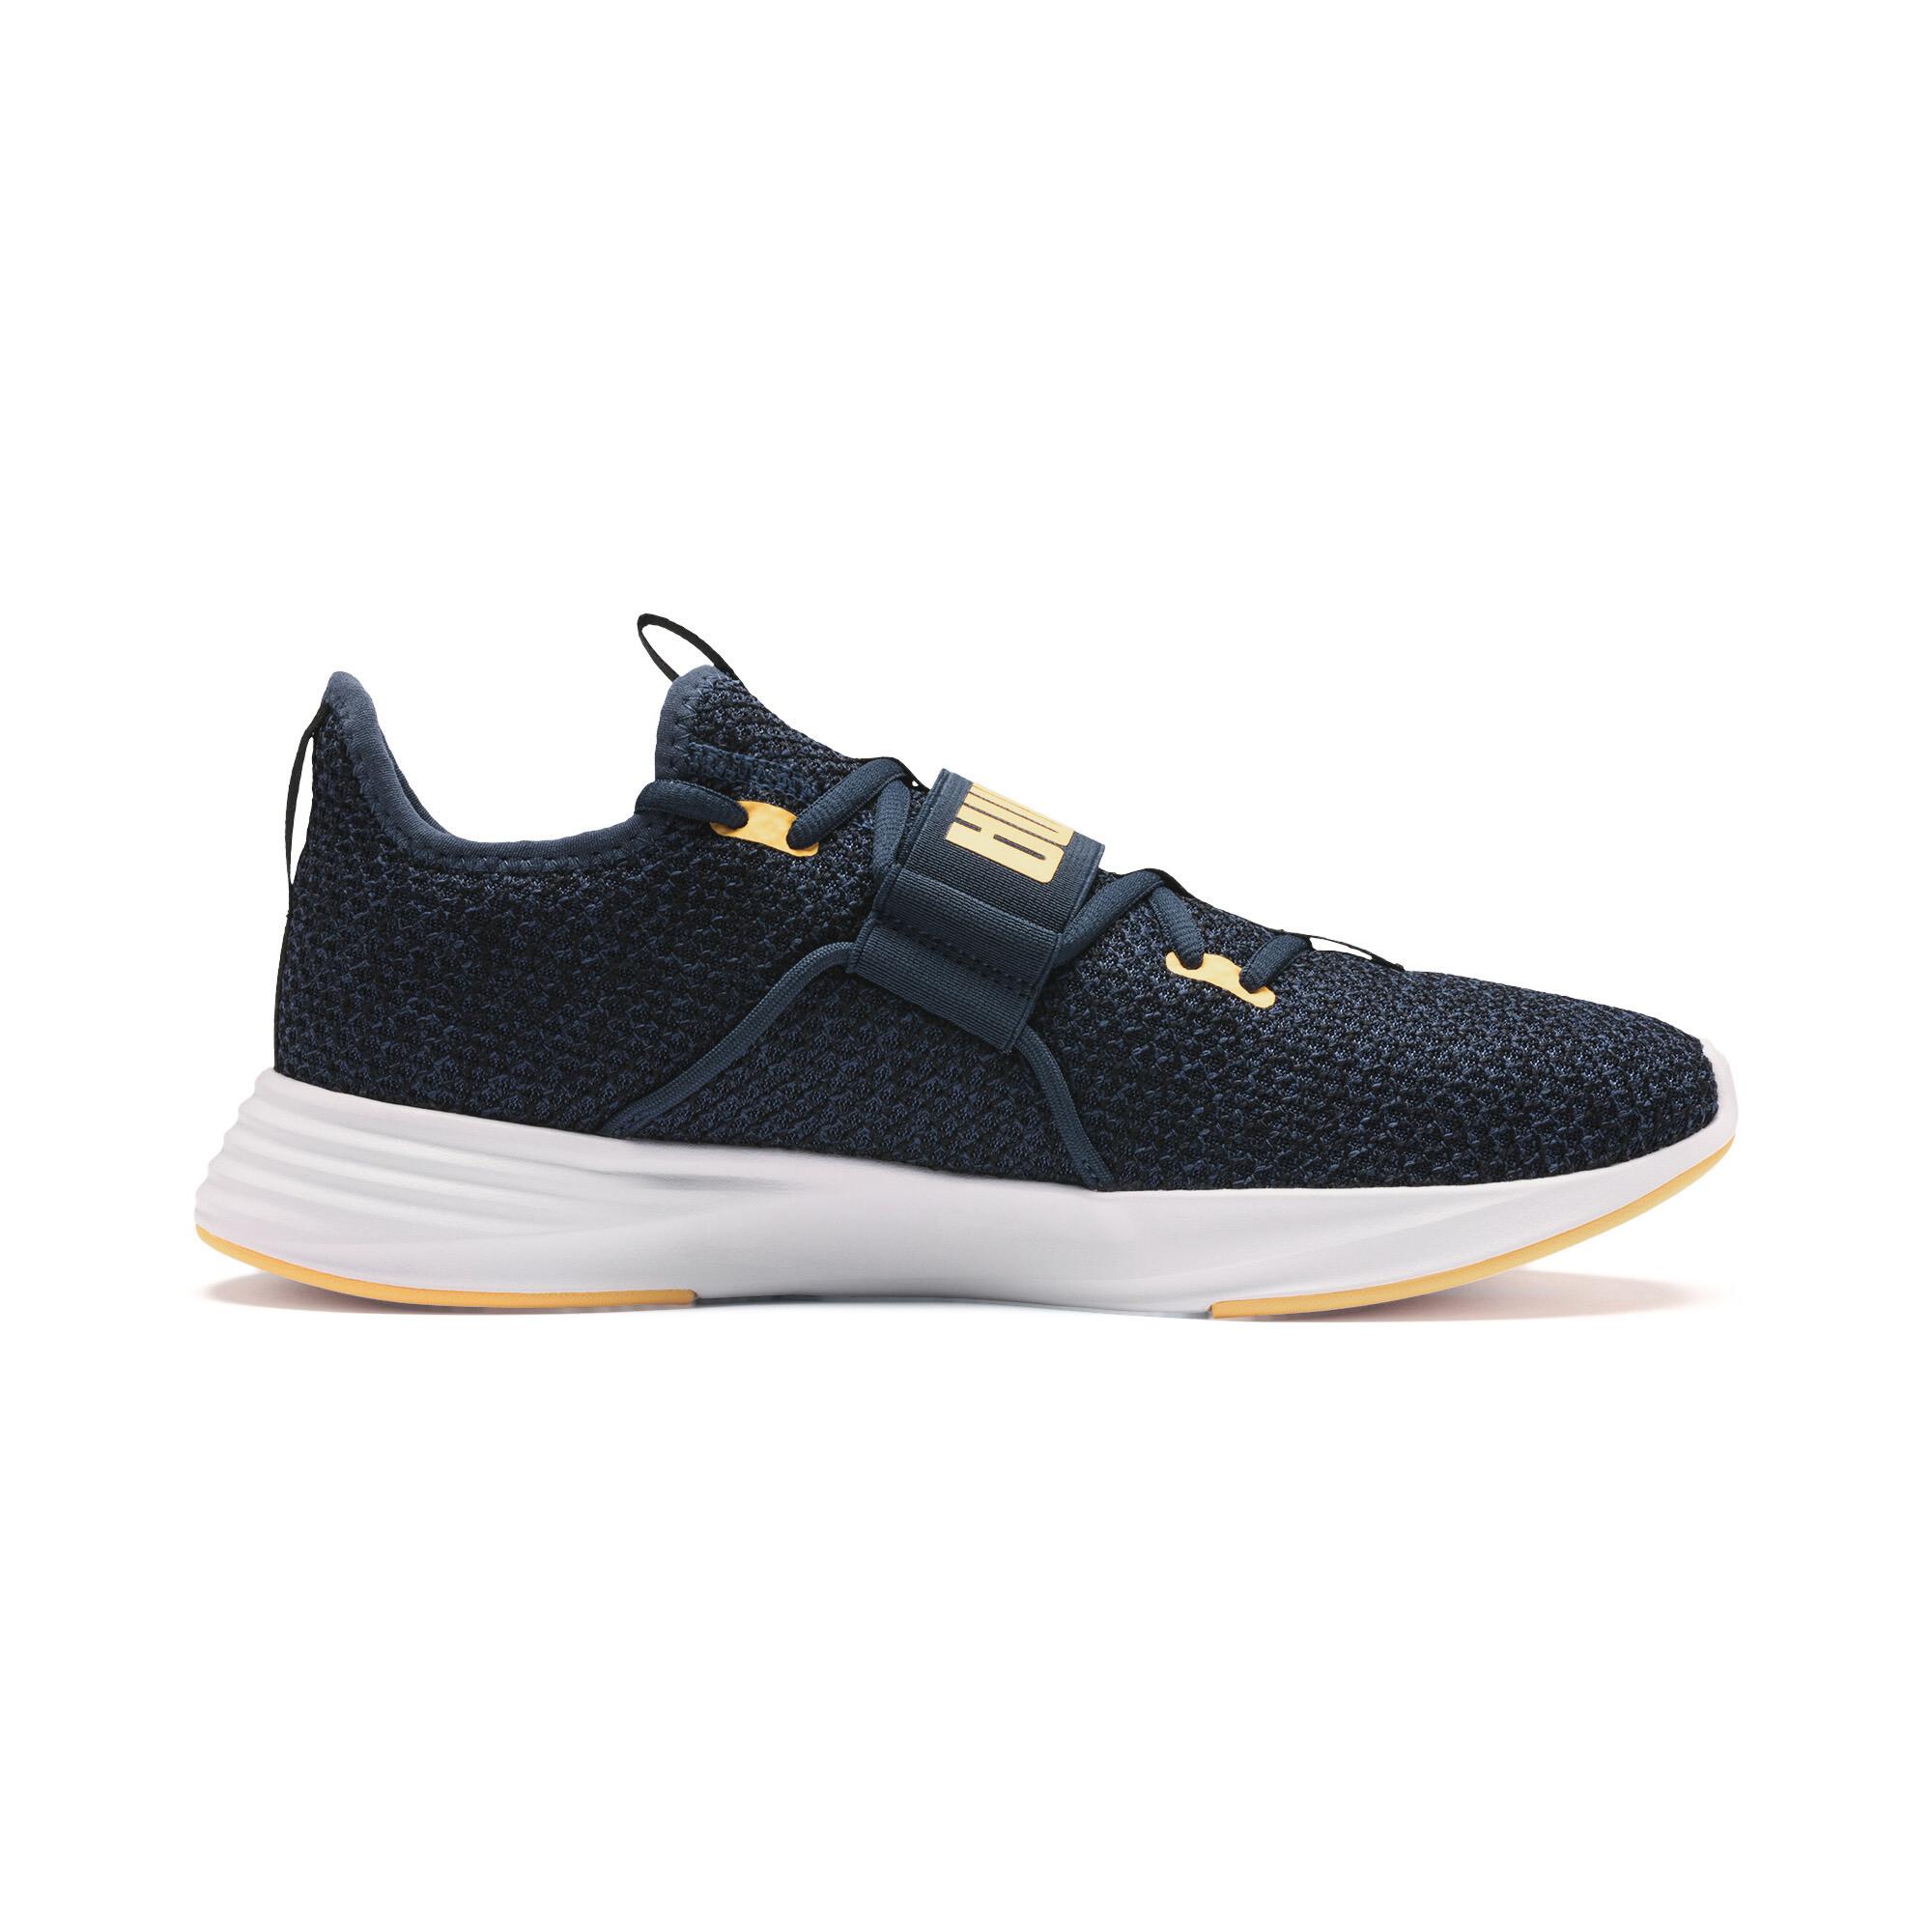 PUMA-Men-039-s-Persist-XT-Knit-Training-Shoes thumbnail 21